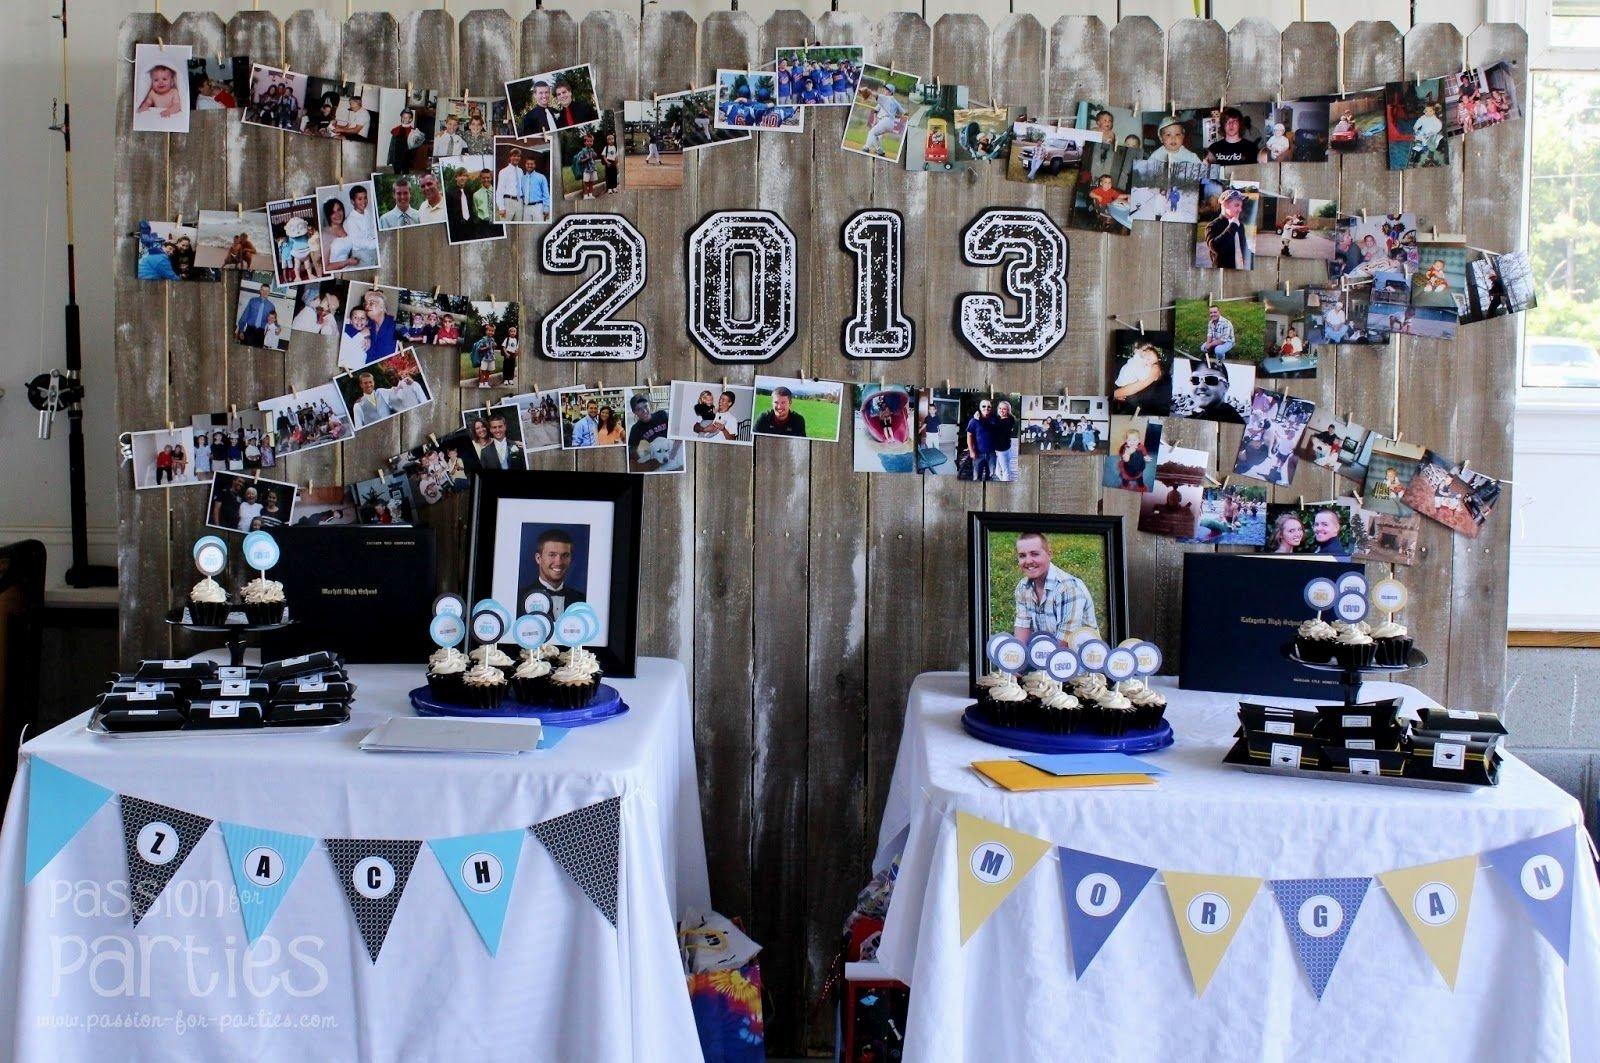 10 Fabulous Graduation Party Ideas For High School graceful image graduation table decorations graduation decorations